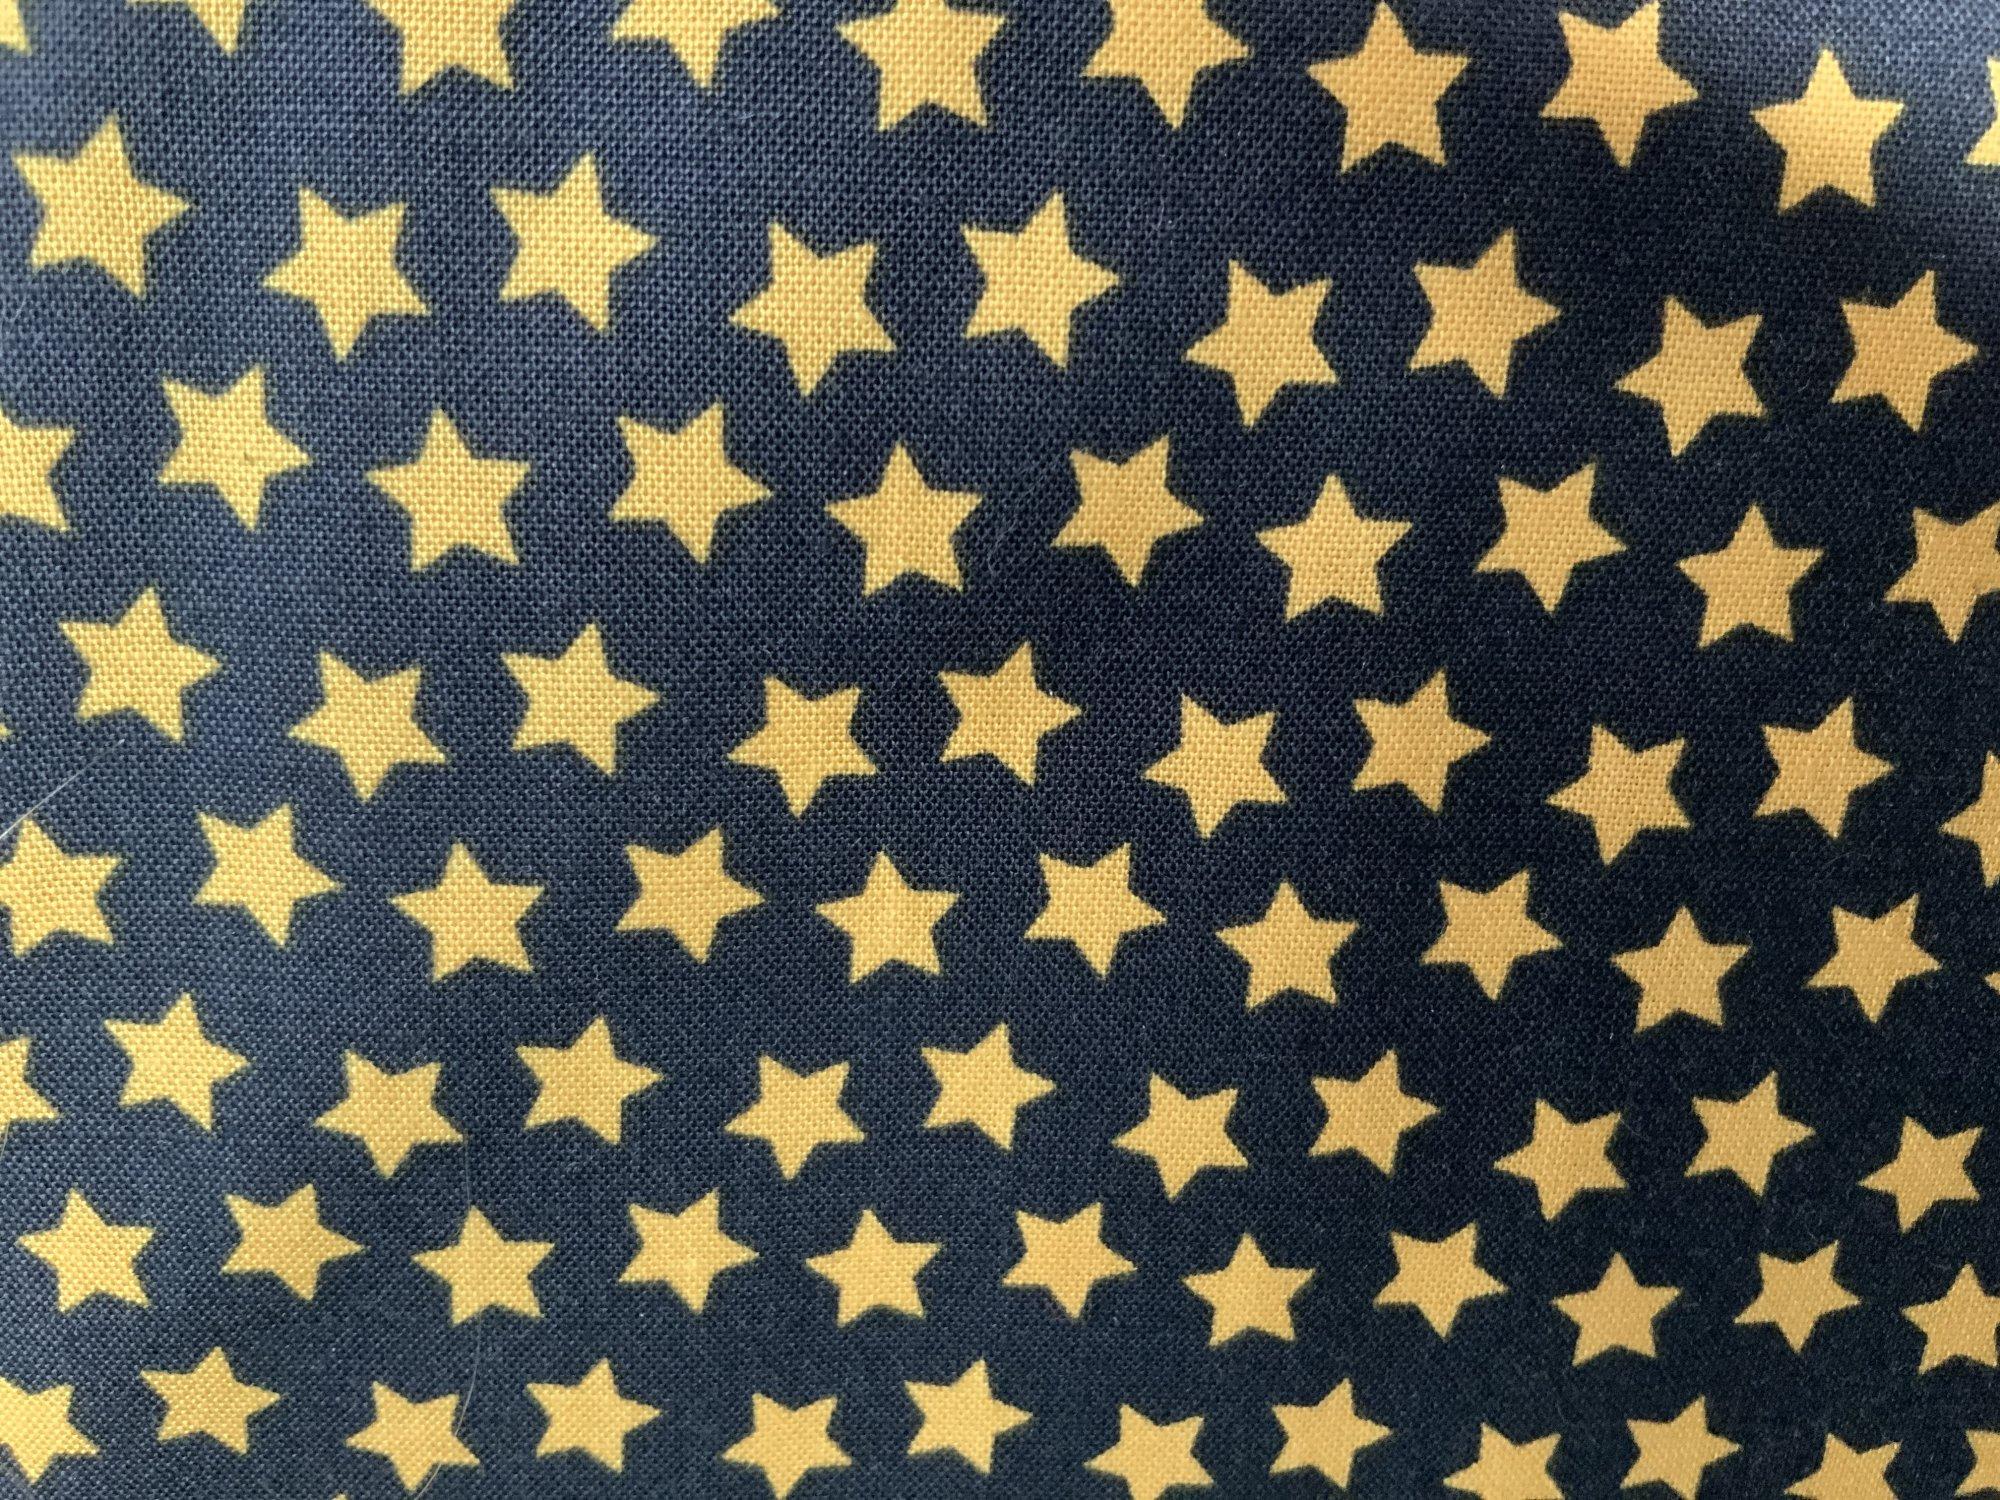 Gold Stars on Black